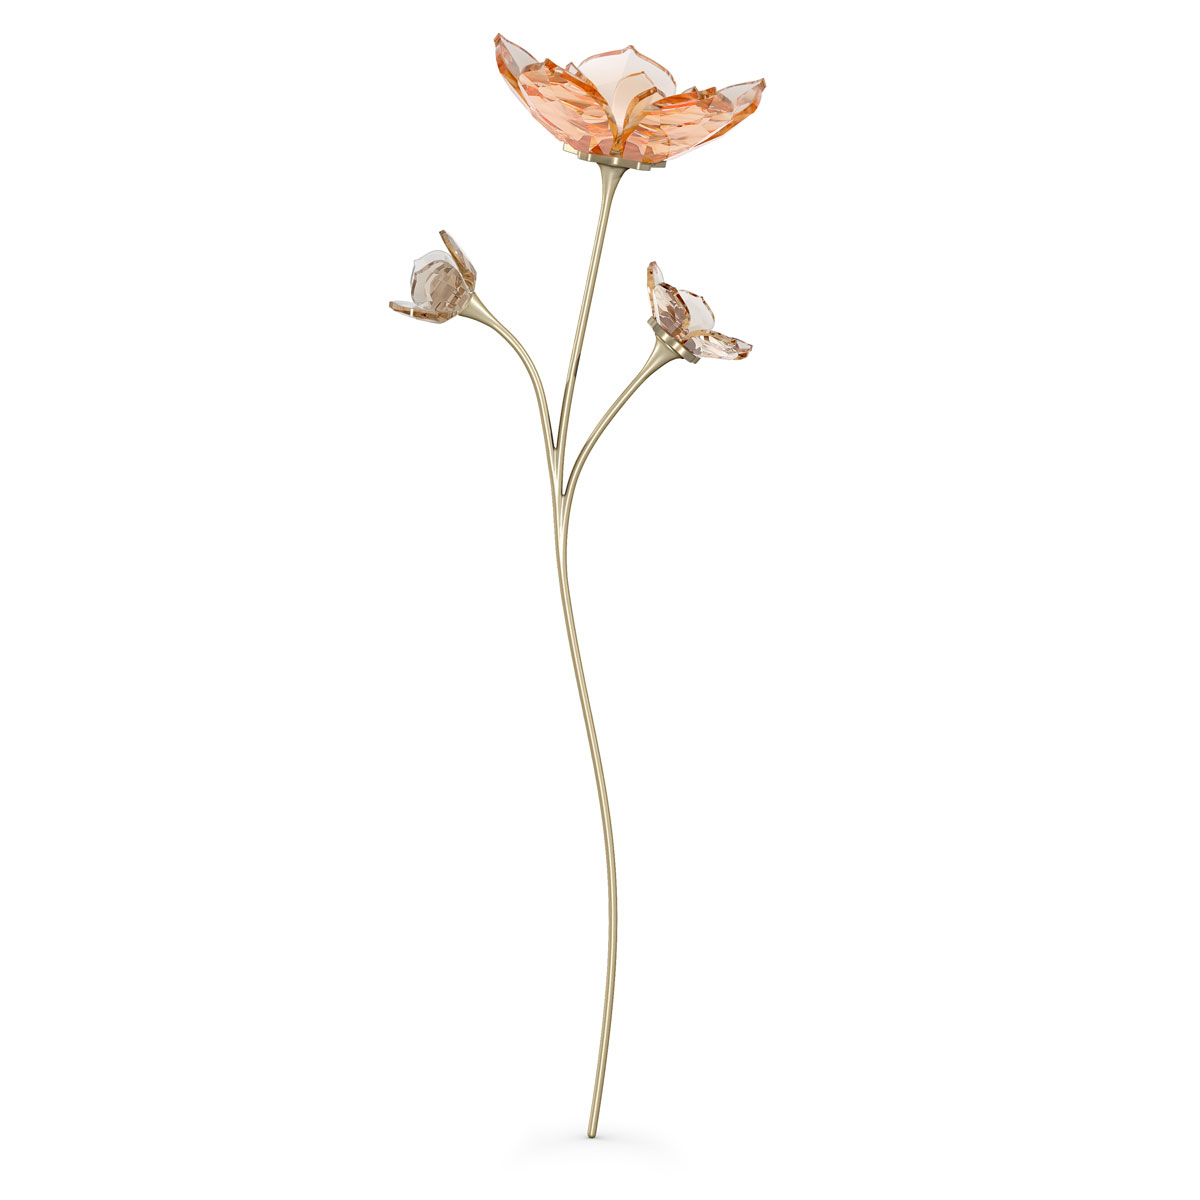 Swarovski Flowers Garden Tales Magnolia